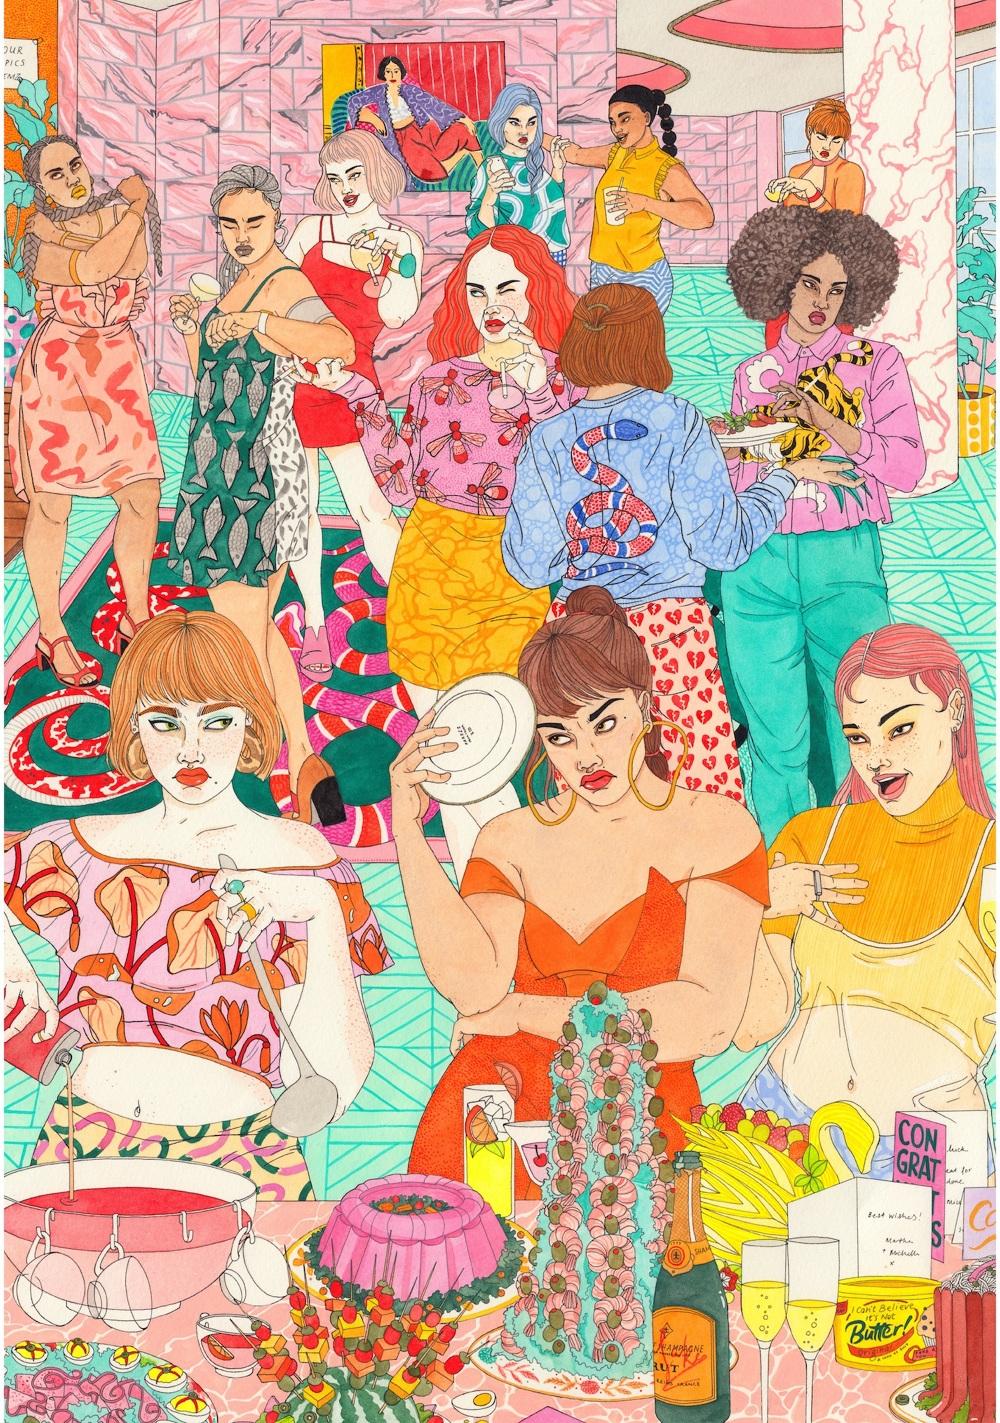 Laura Callahan, The Intersectional Feminist // DNAMAG